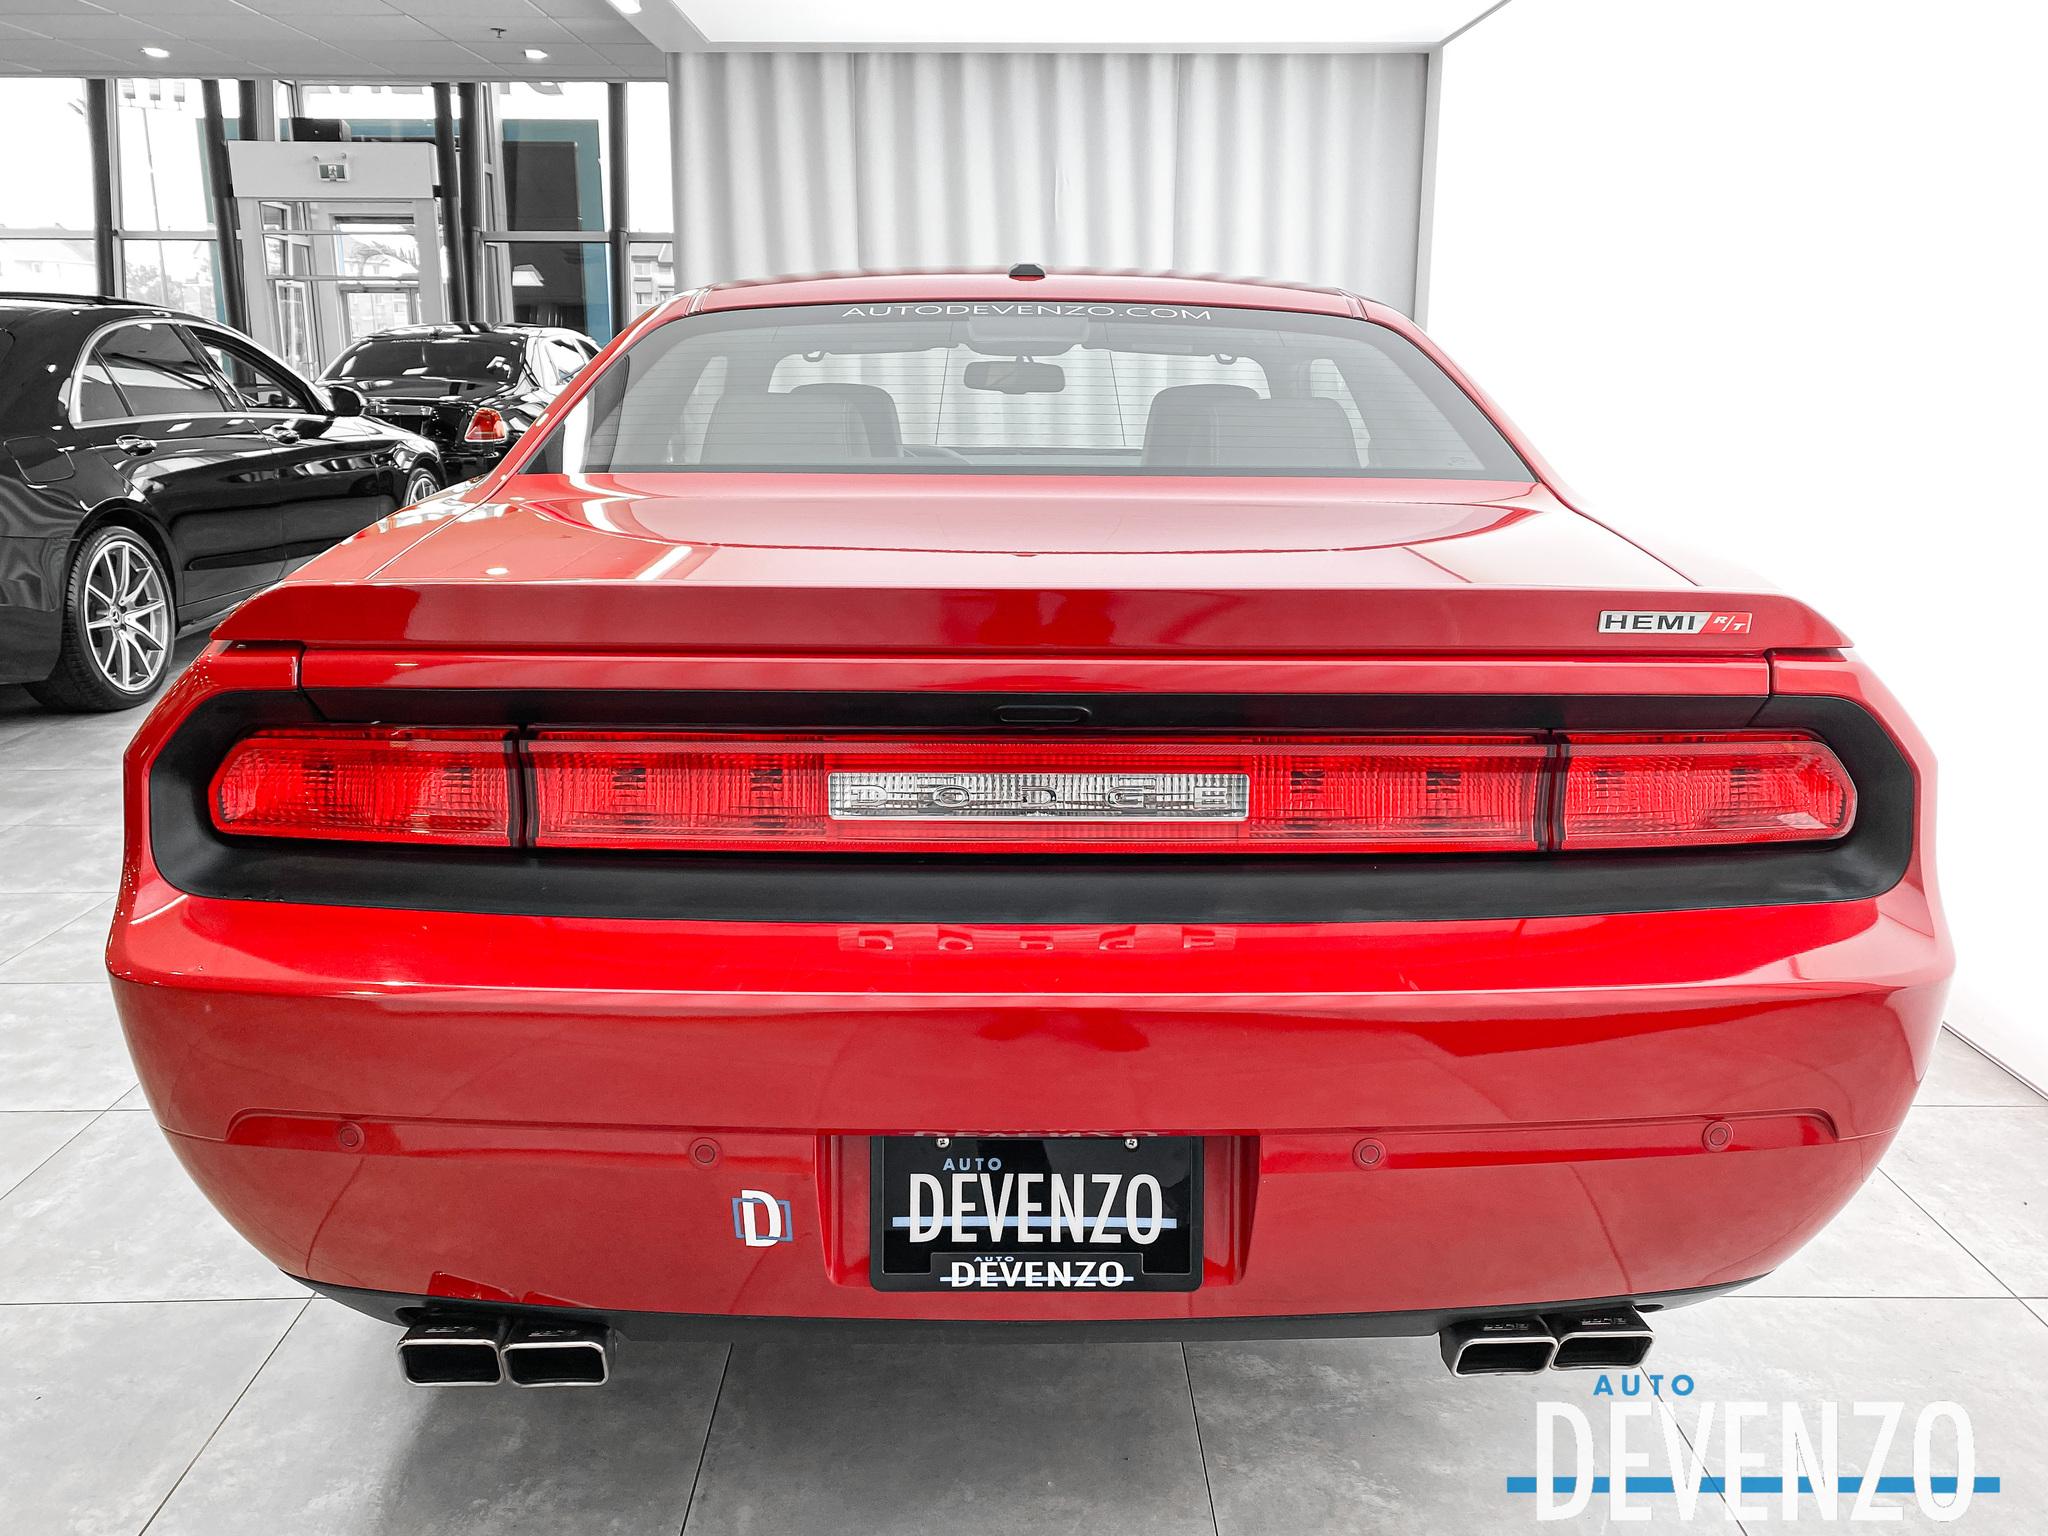 2013 Dodge Challenger R/T Classic 5.7L V8 HEMI BORLA Exhaust complet